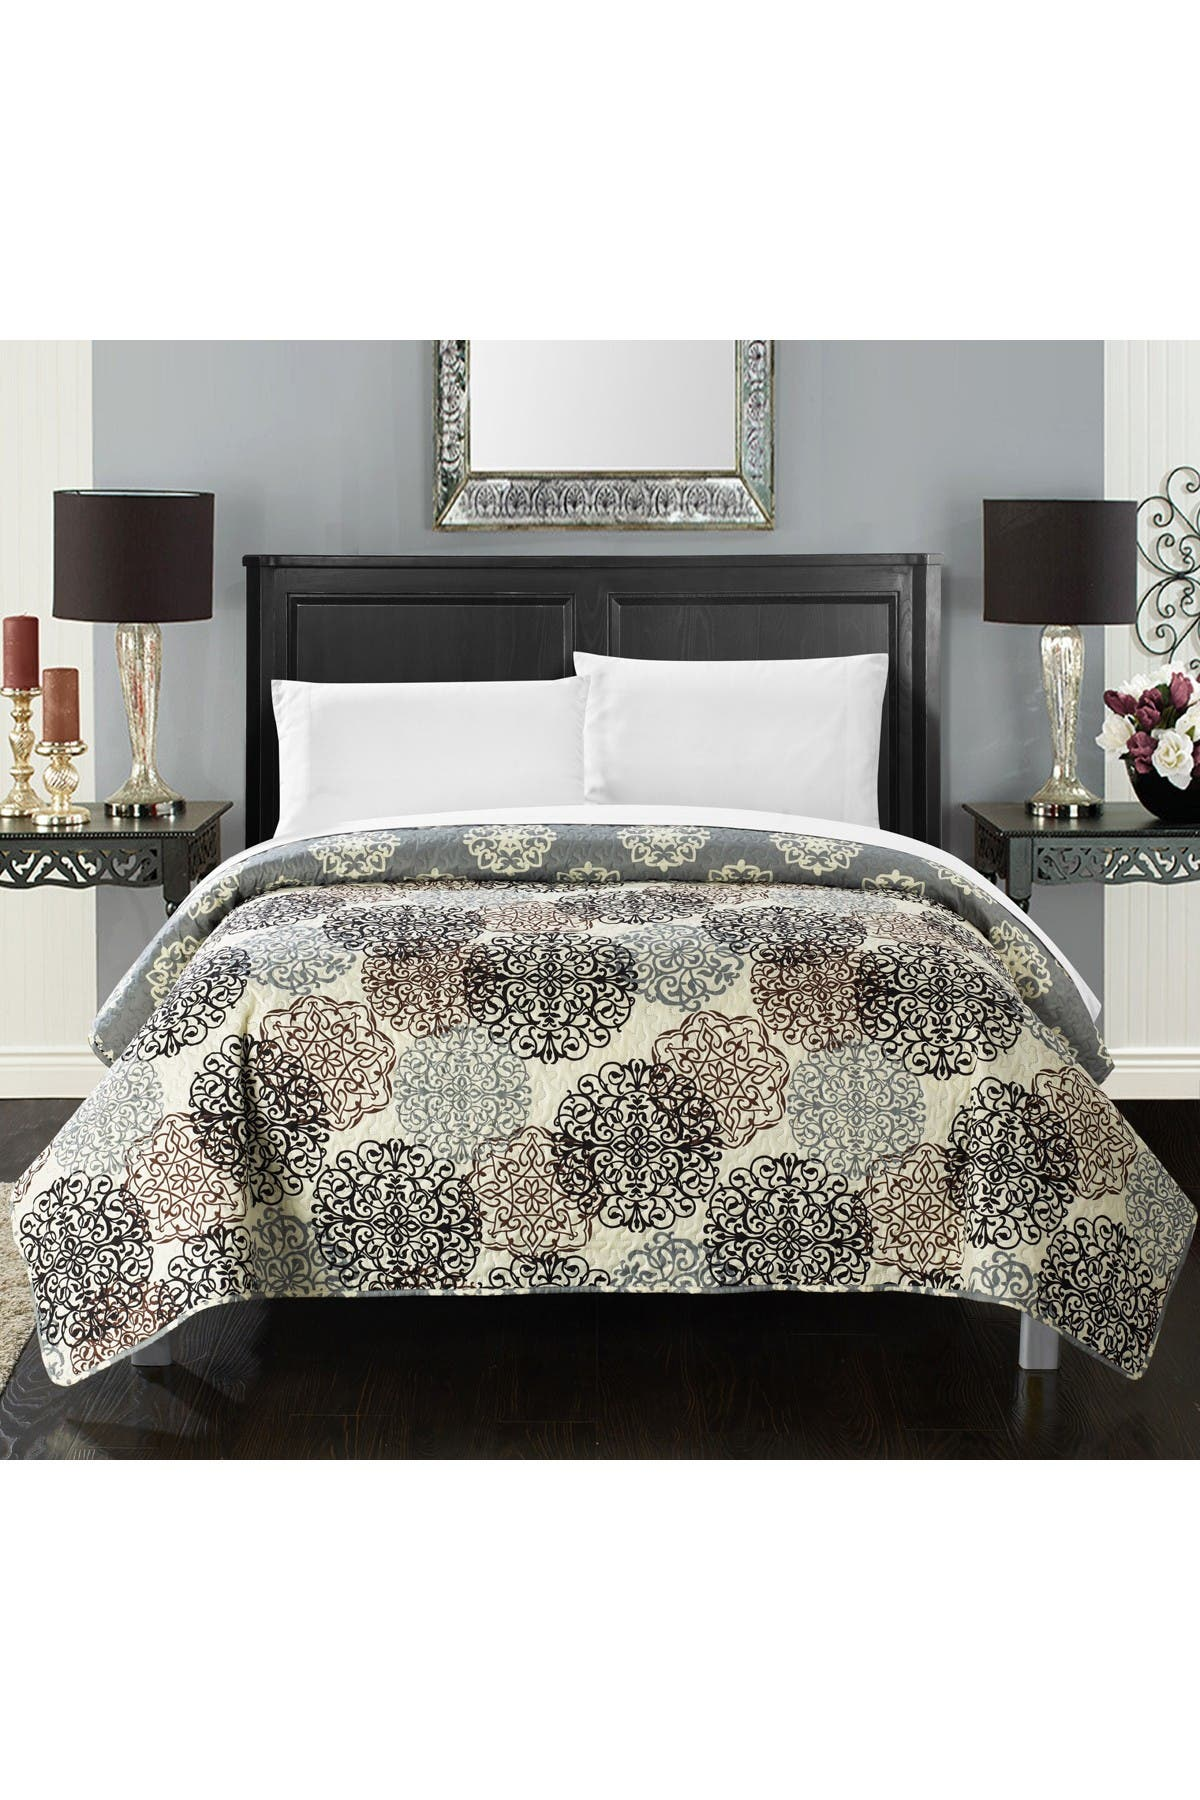 Image of Chic Home Bedding Queen Jennifer Boho Inspired Reversible Quilt - Beige